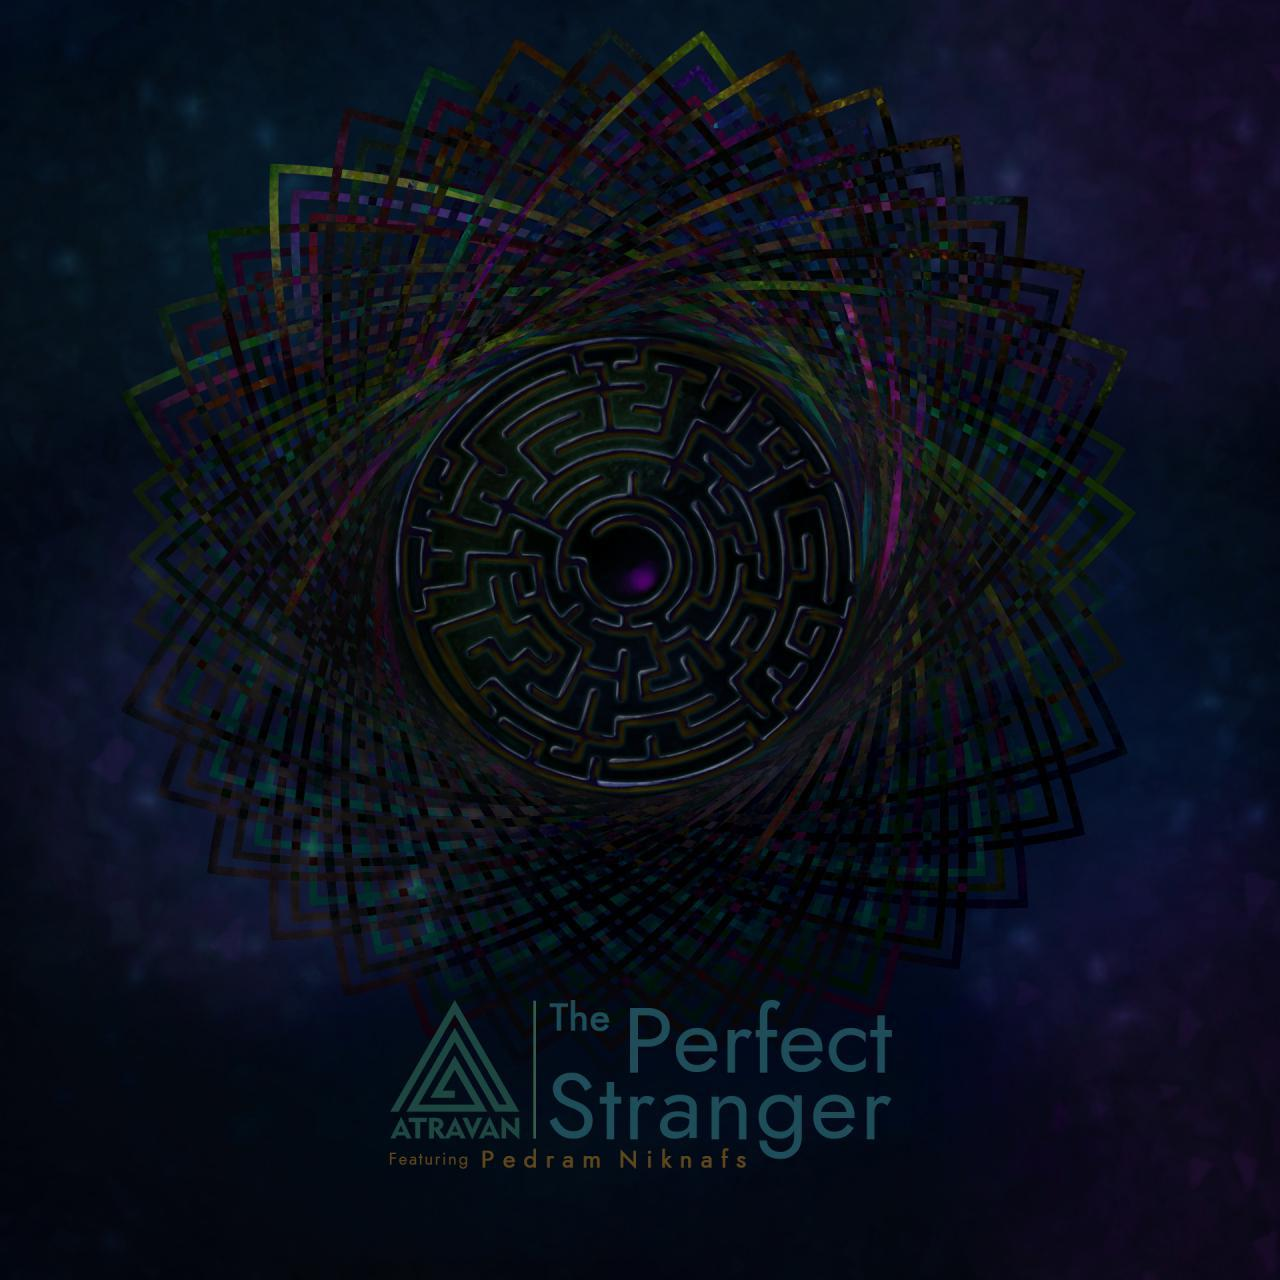 Atravan – The Perfect Stranger (Ft Pedram Niknafs)